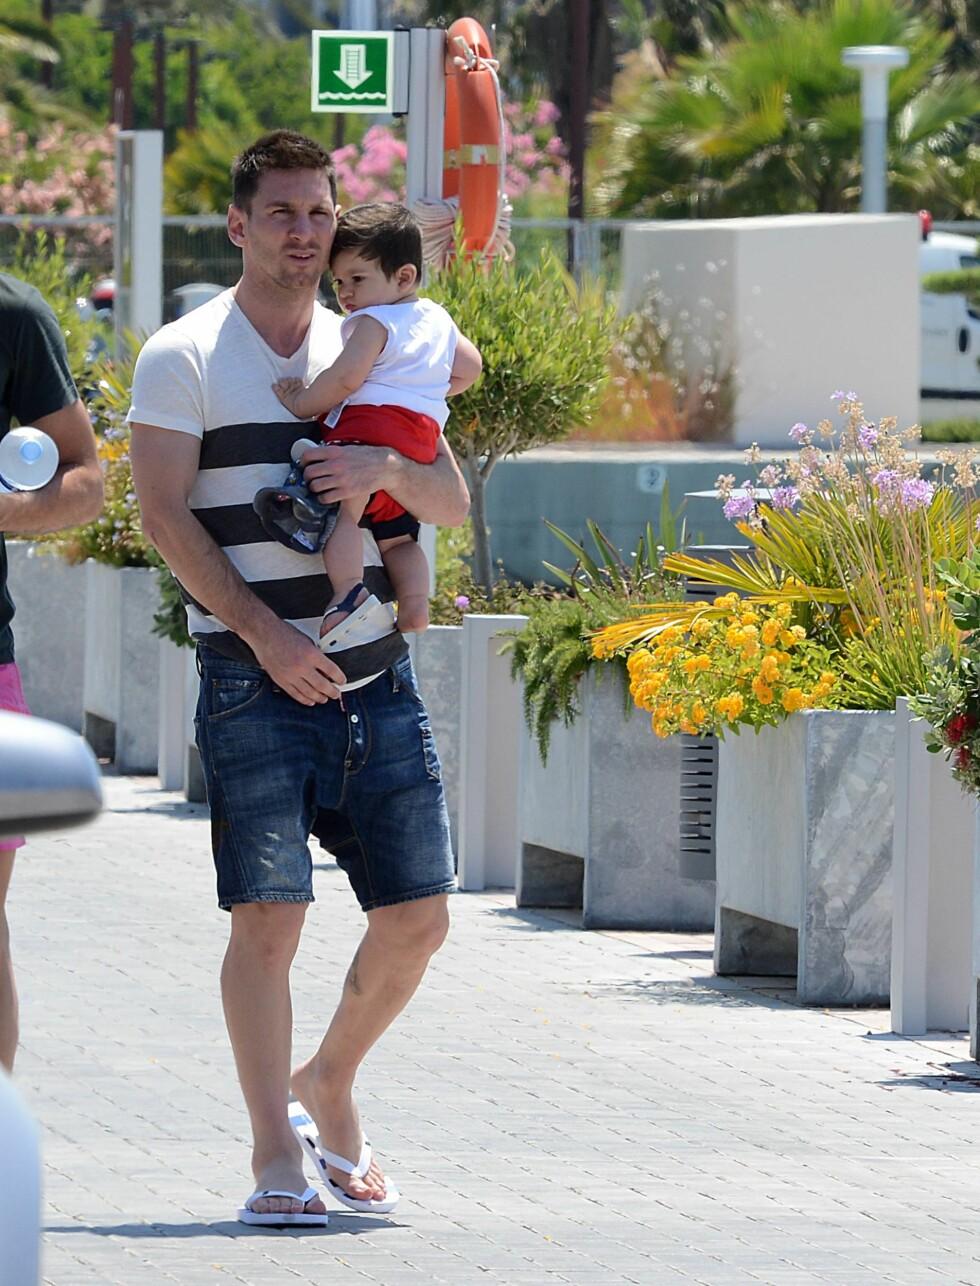 KOS: Messi og sønnen Thiago på Ibiza i 2013. Foto: Splash News/ All Over Press